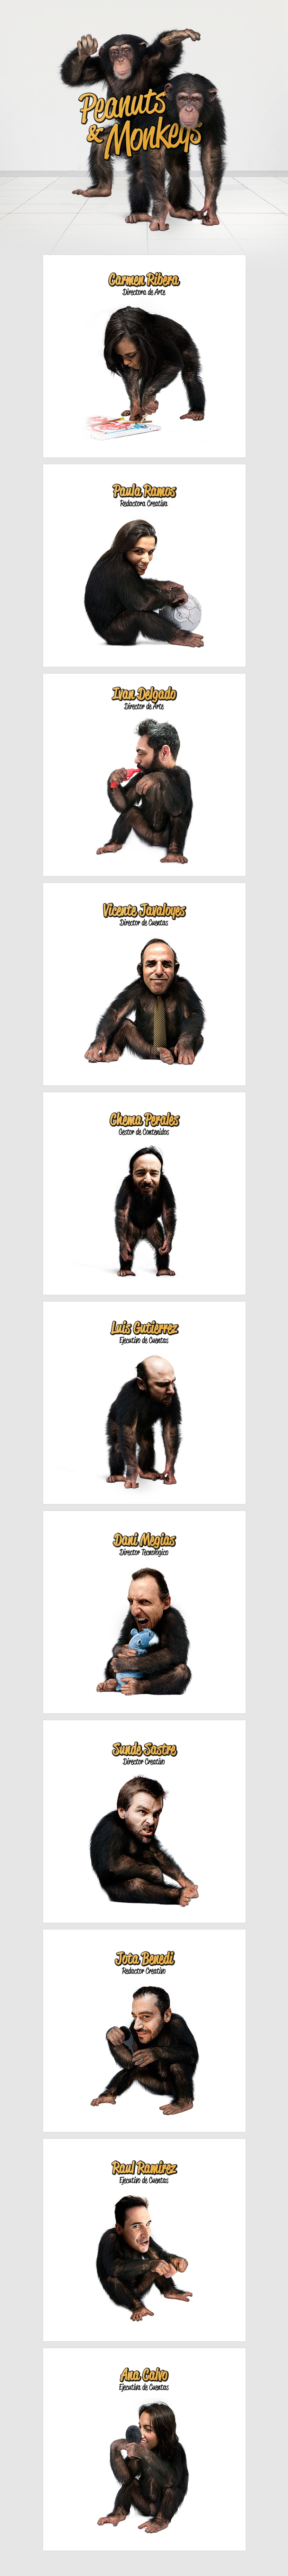 Peanuts & Monkeys / Fotomontajes Web Corporativa -1